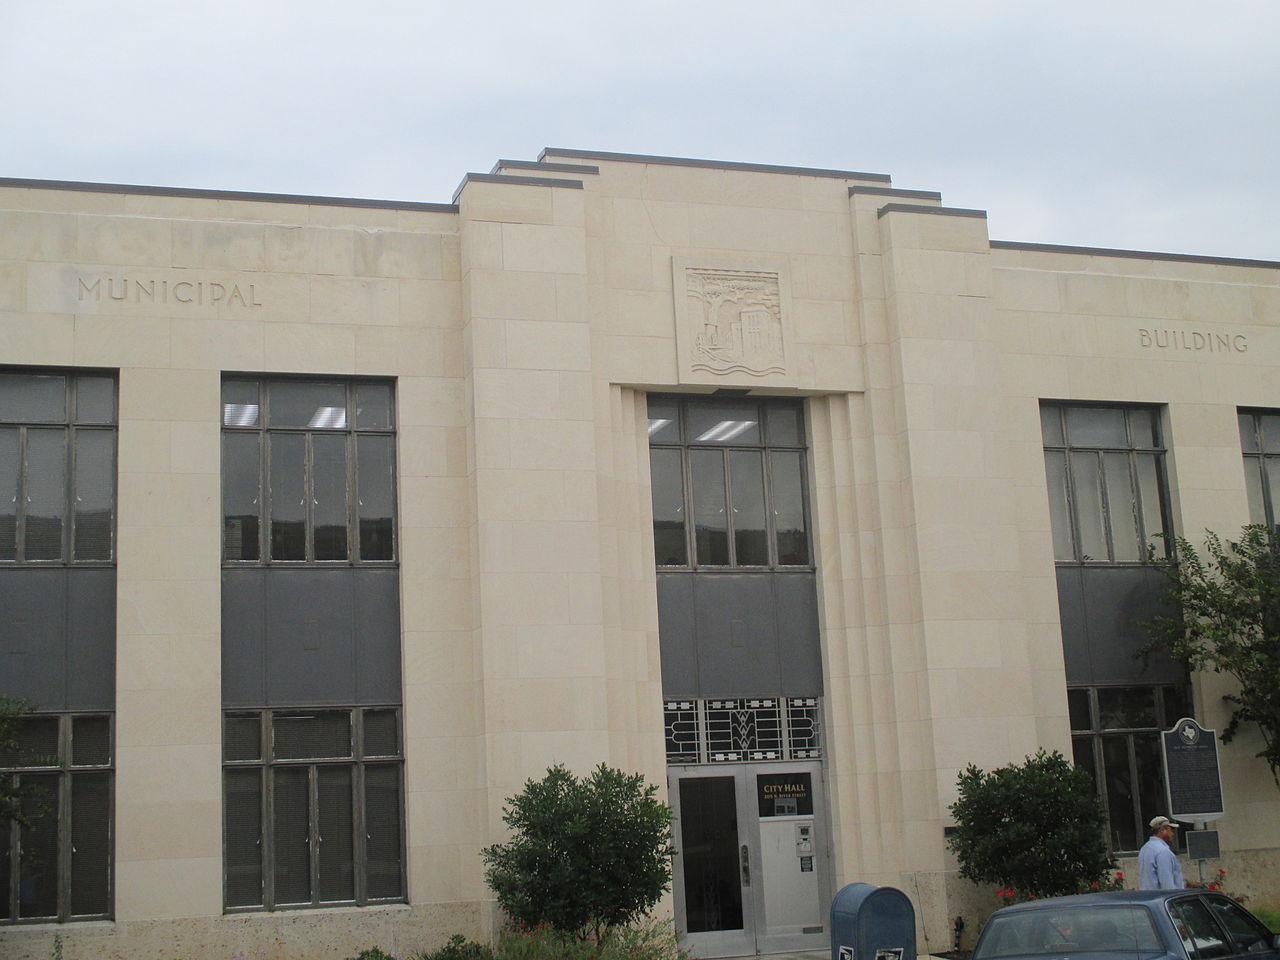 municipal_building_in_seguin_tx_img_8178